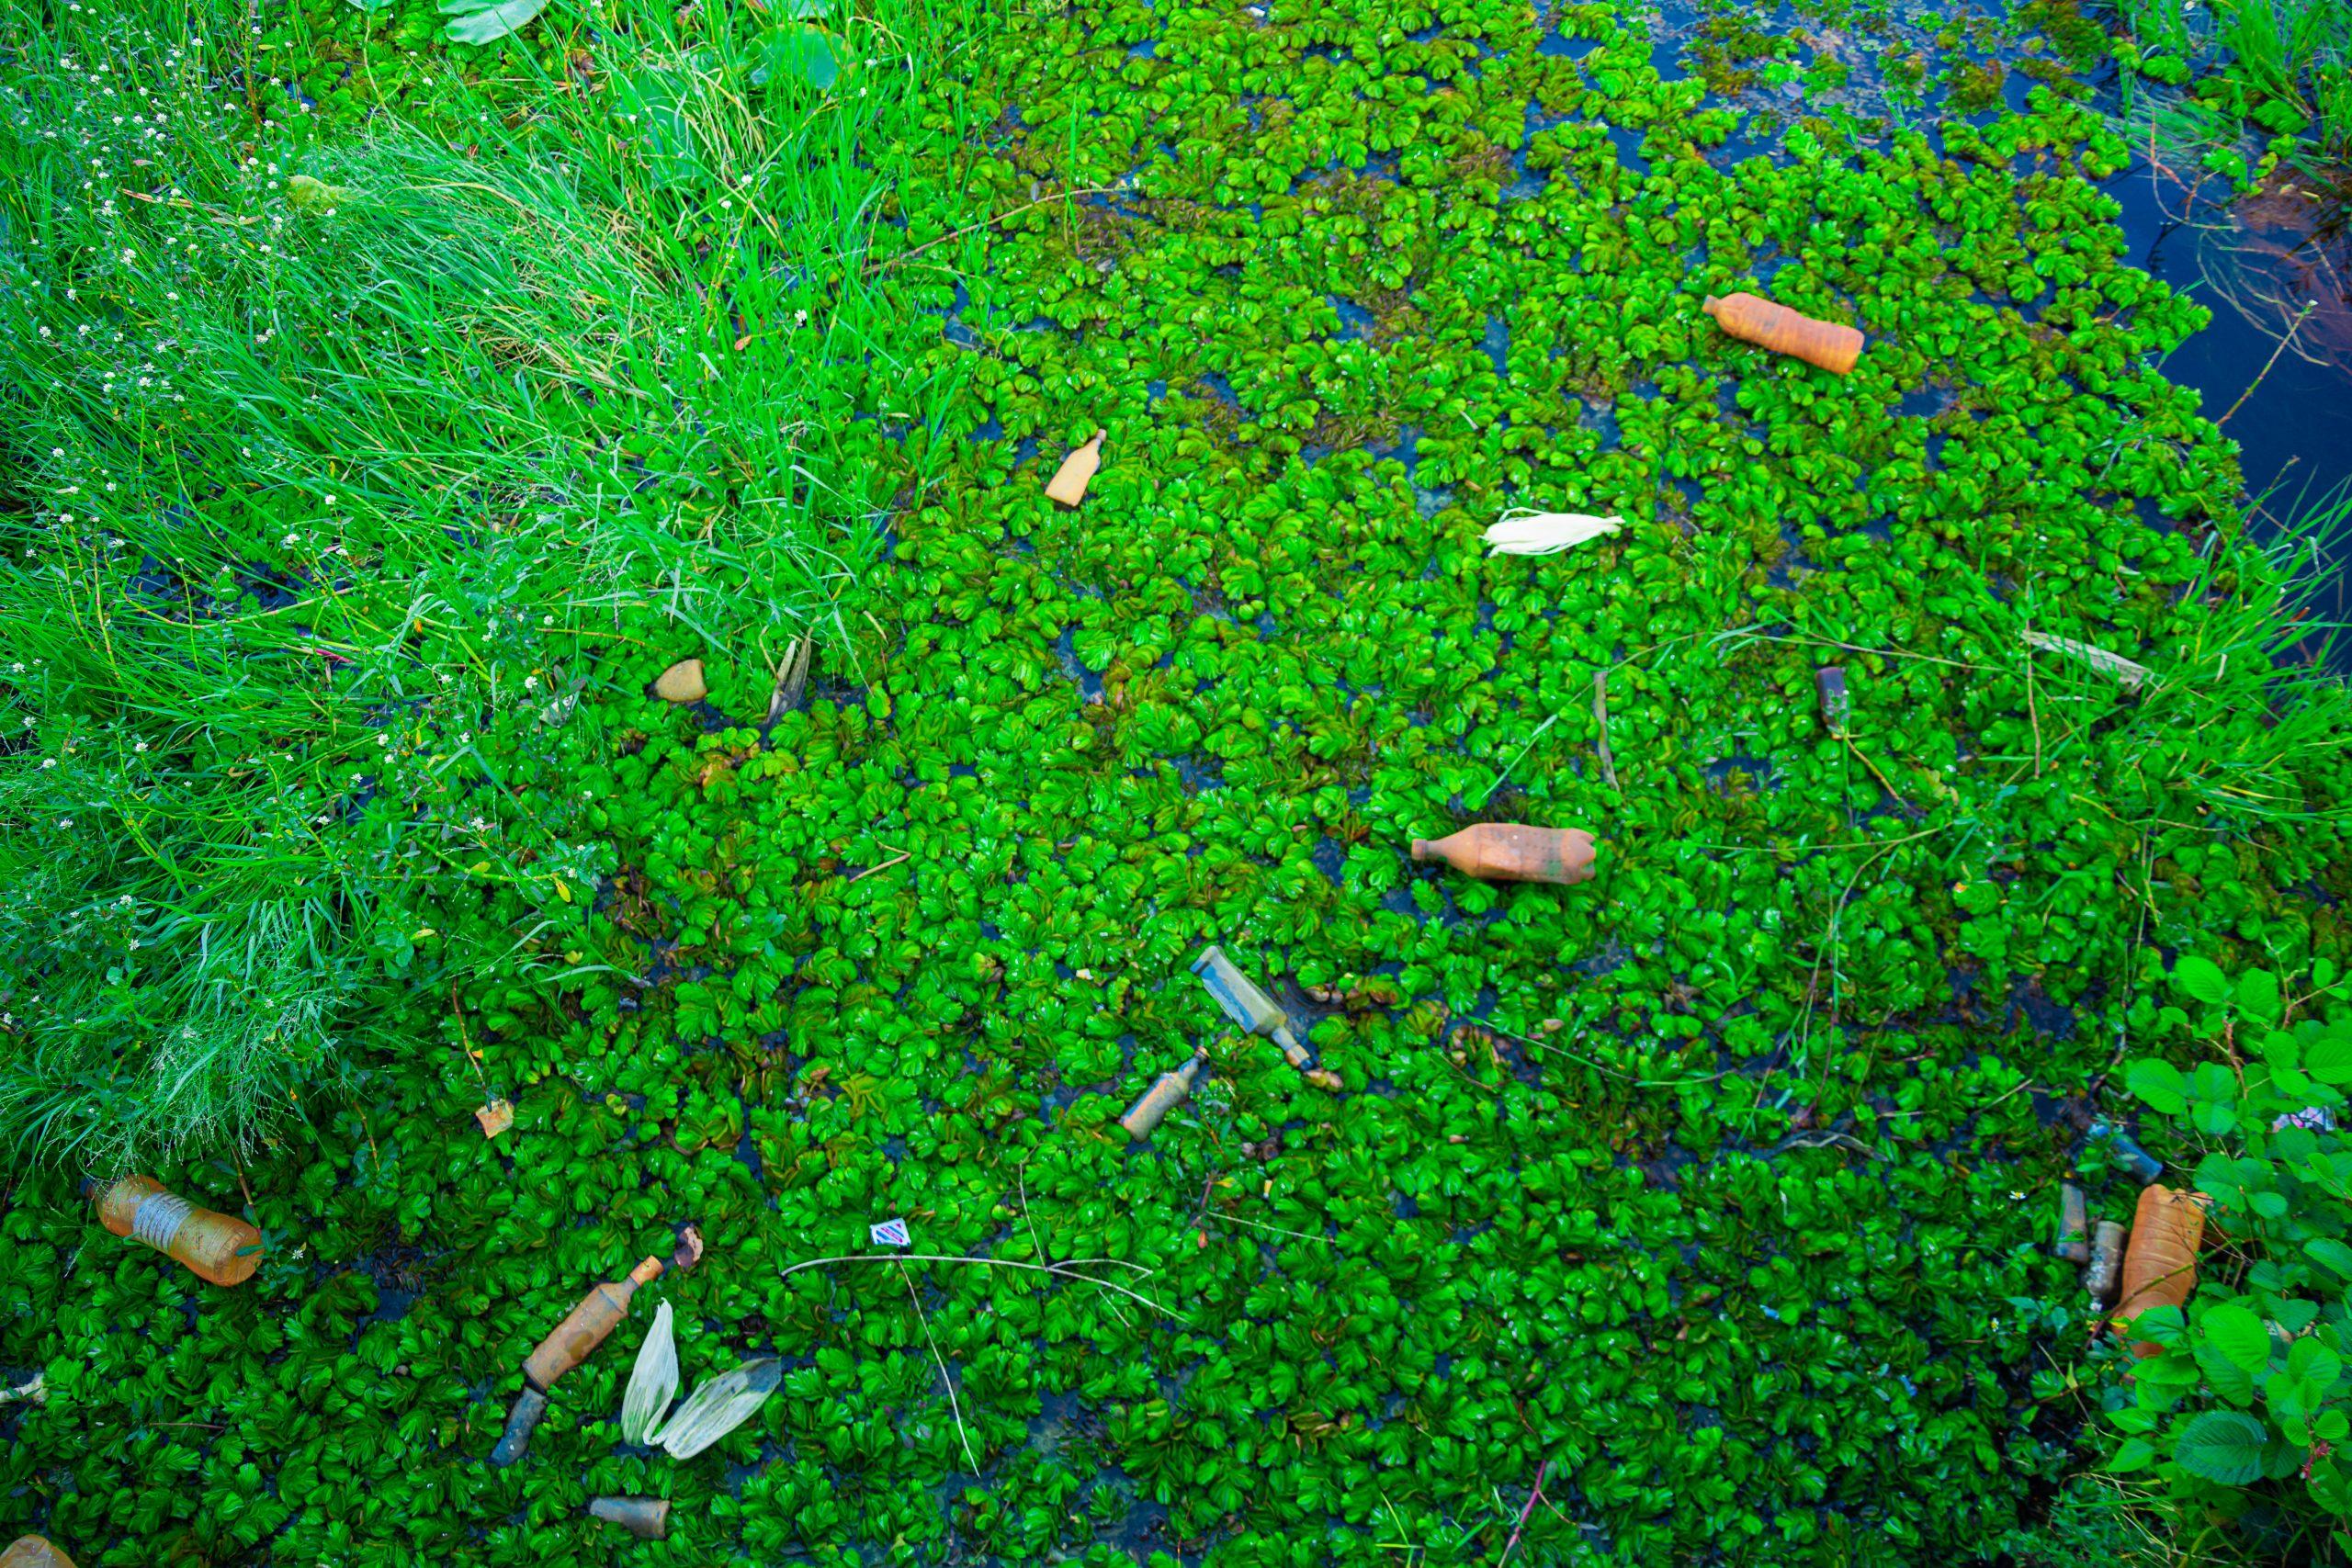 Plastic bottles floating in a lake